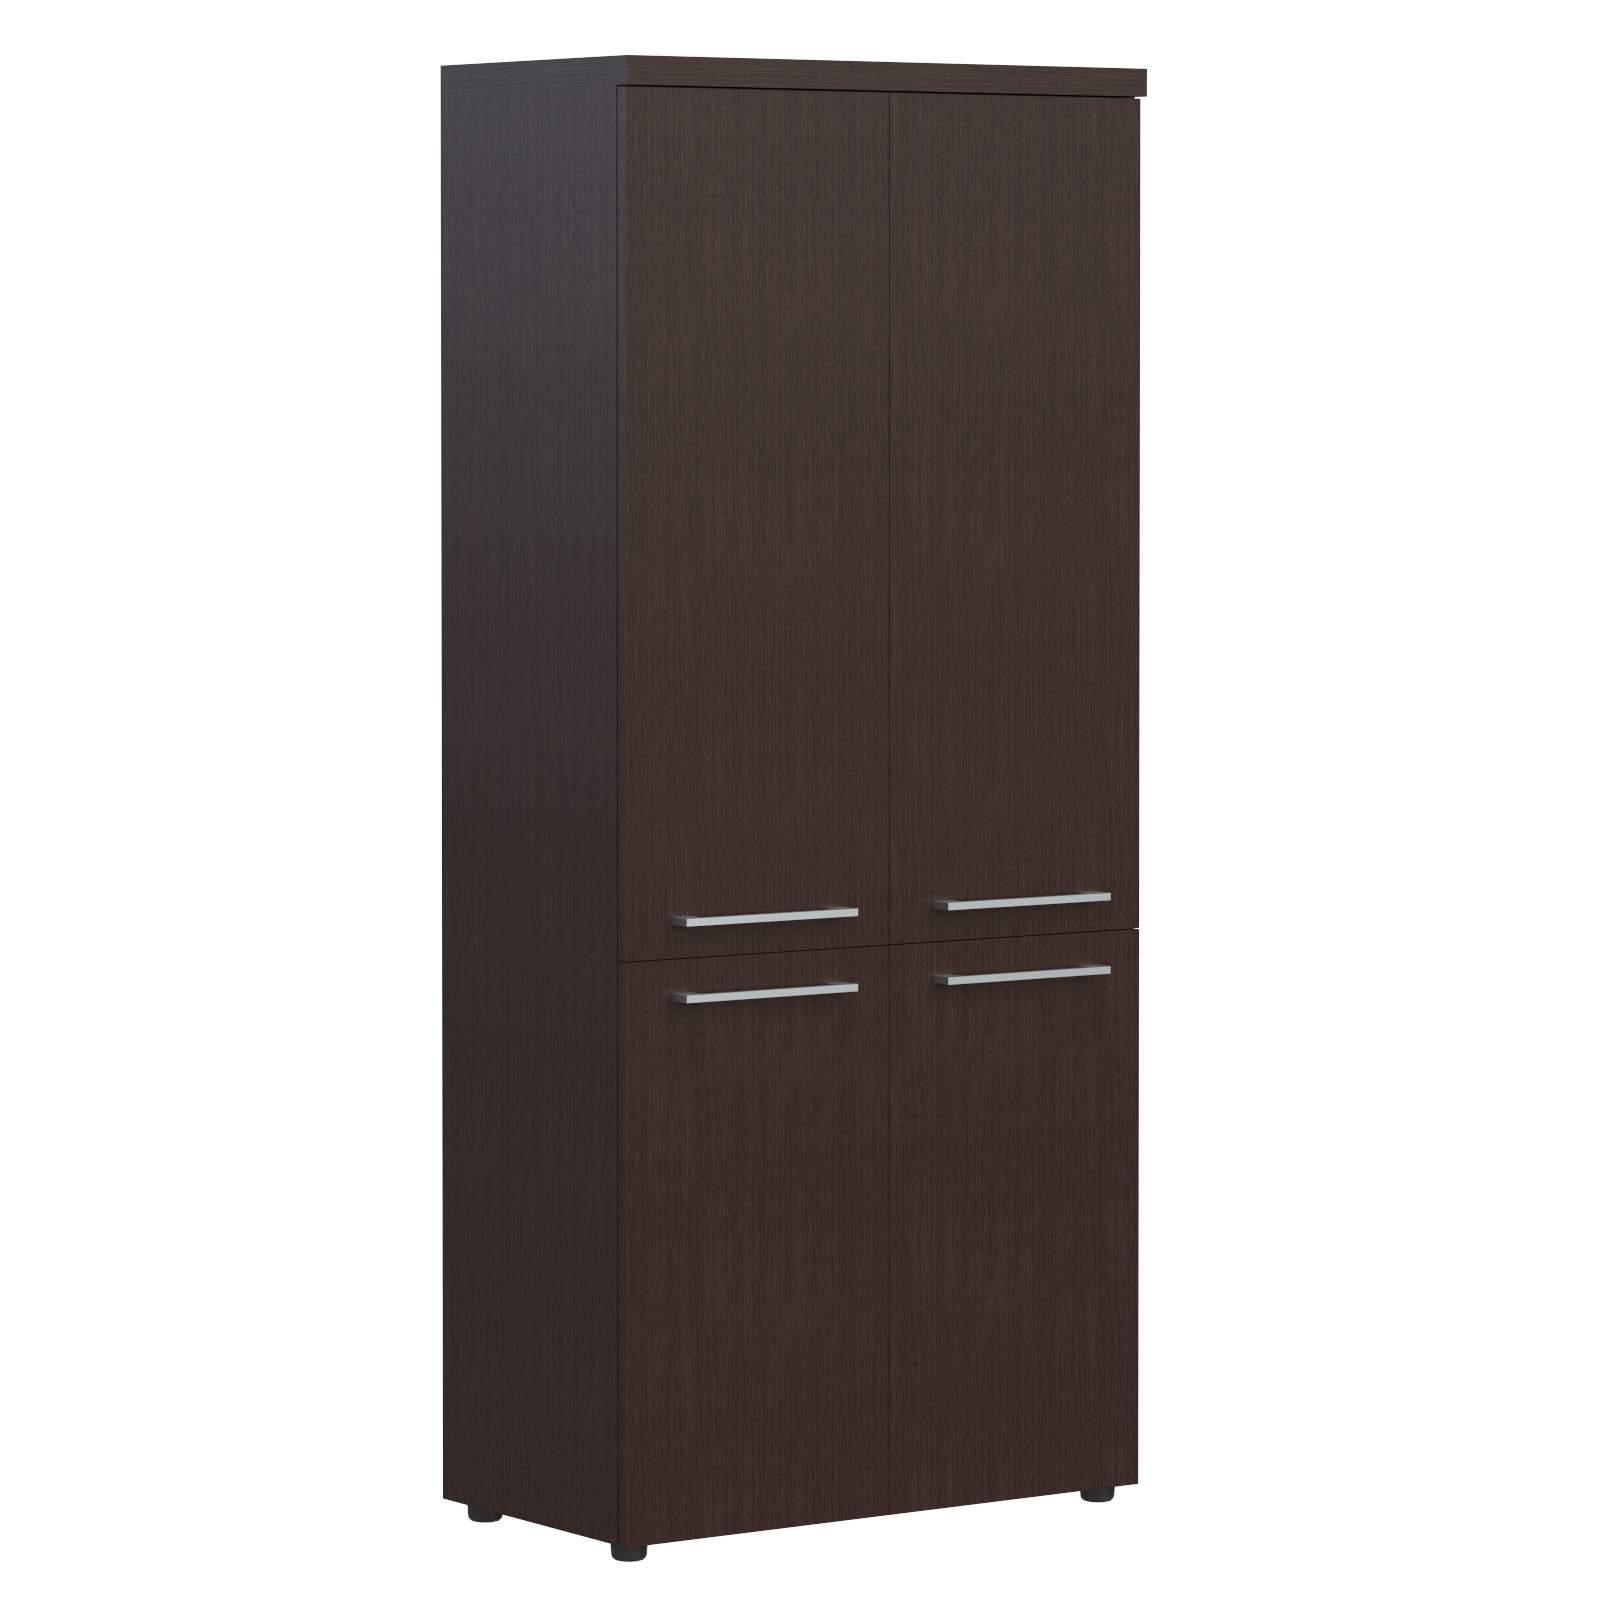 Шкаф закрытый 850x430x1930